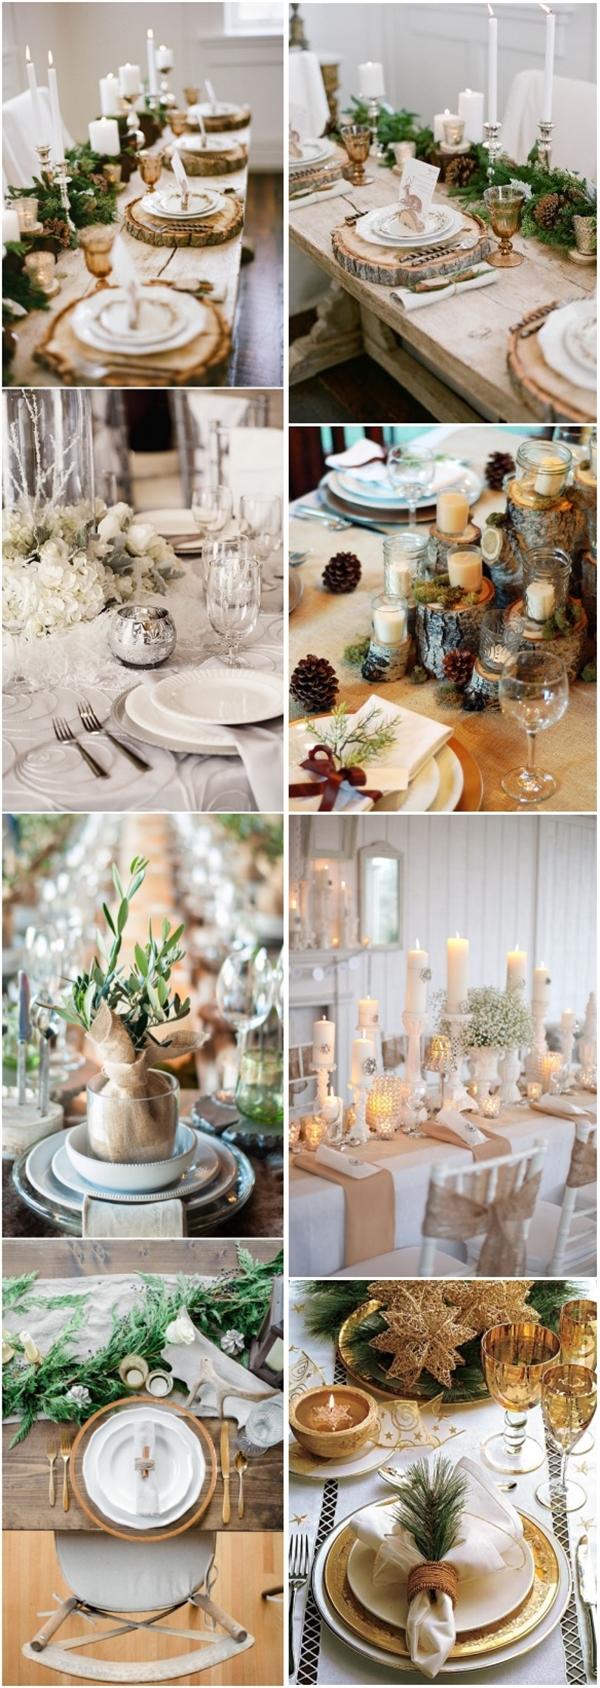 Wedding Table Ideas 30 Spectacular Winter Wedding Table Setting Ideas Deer Pearl Flowers